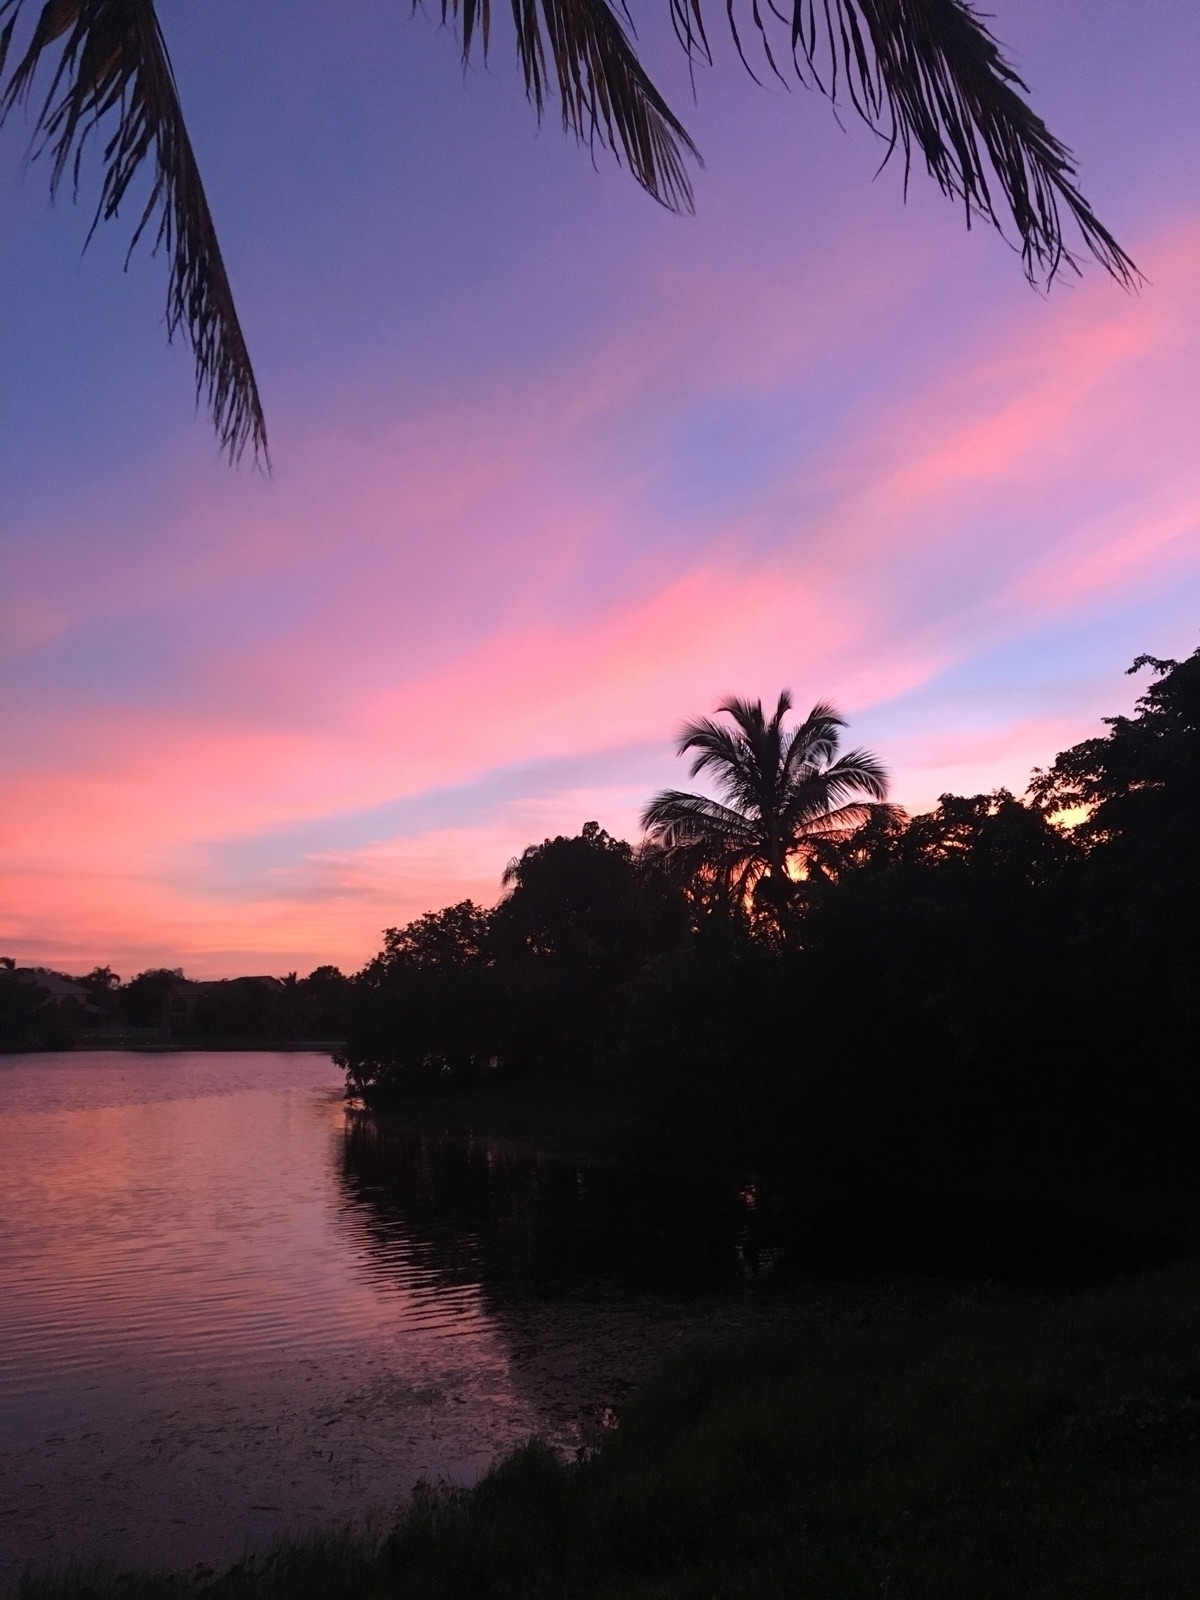 Sunset FL - game30 | ello